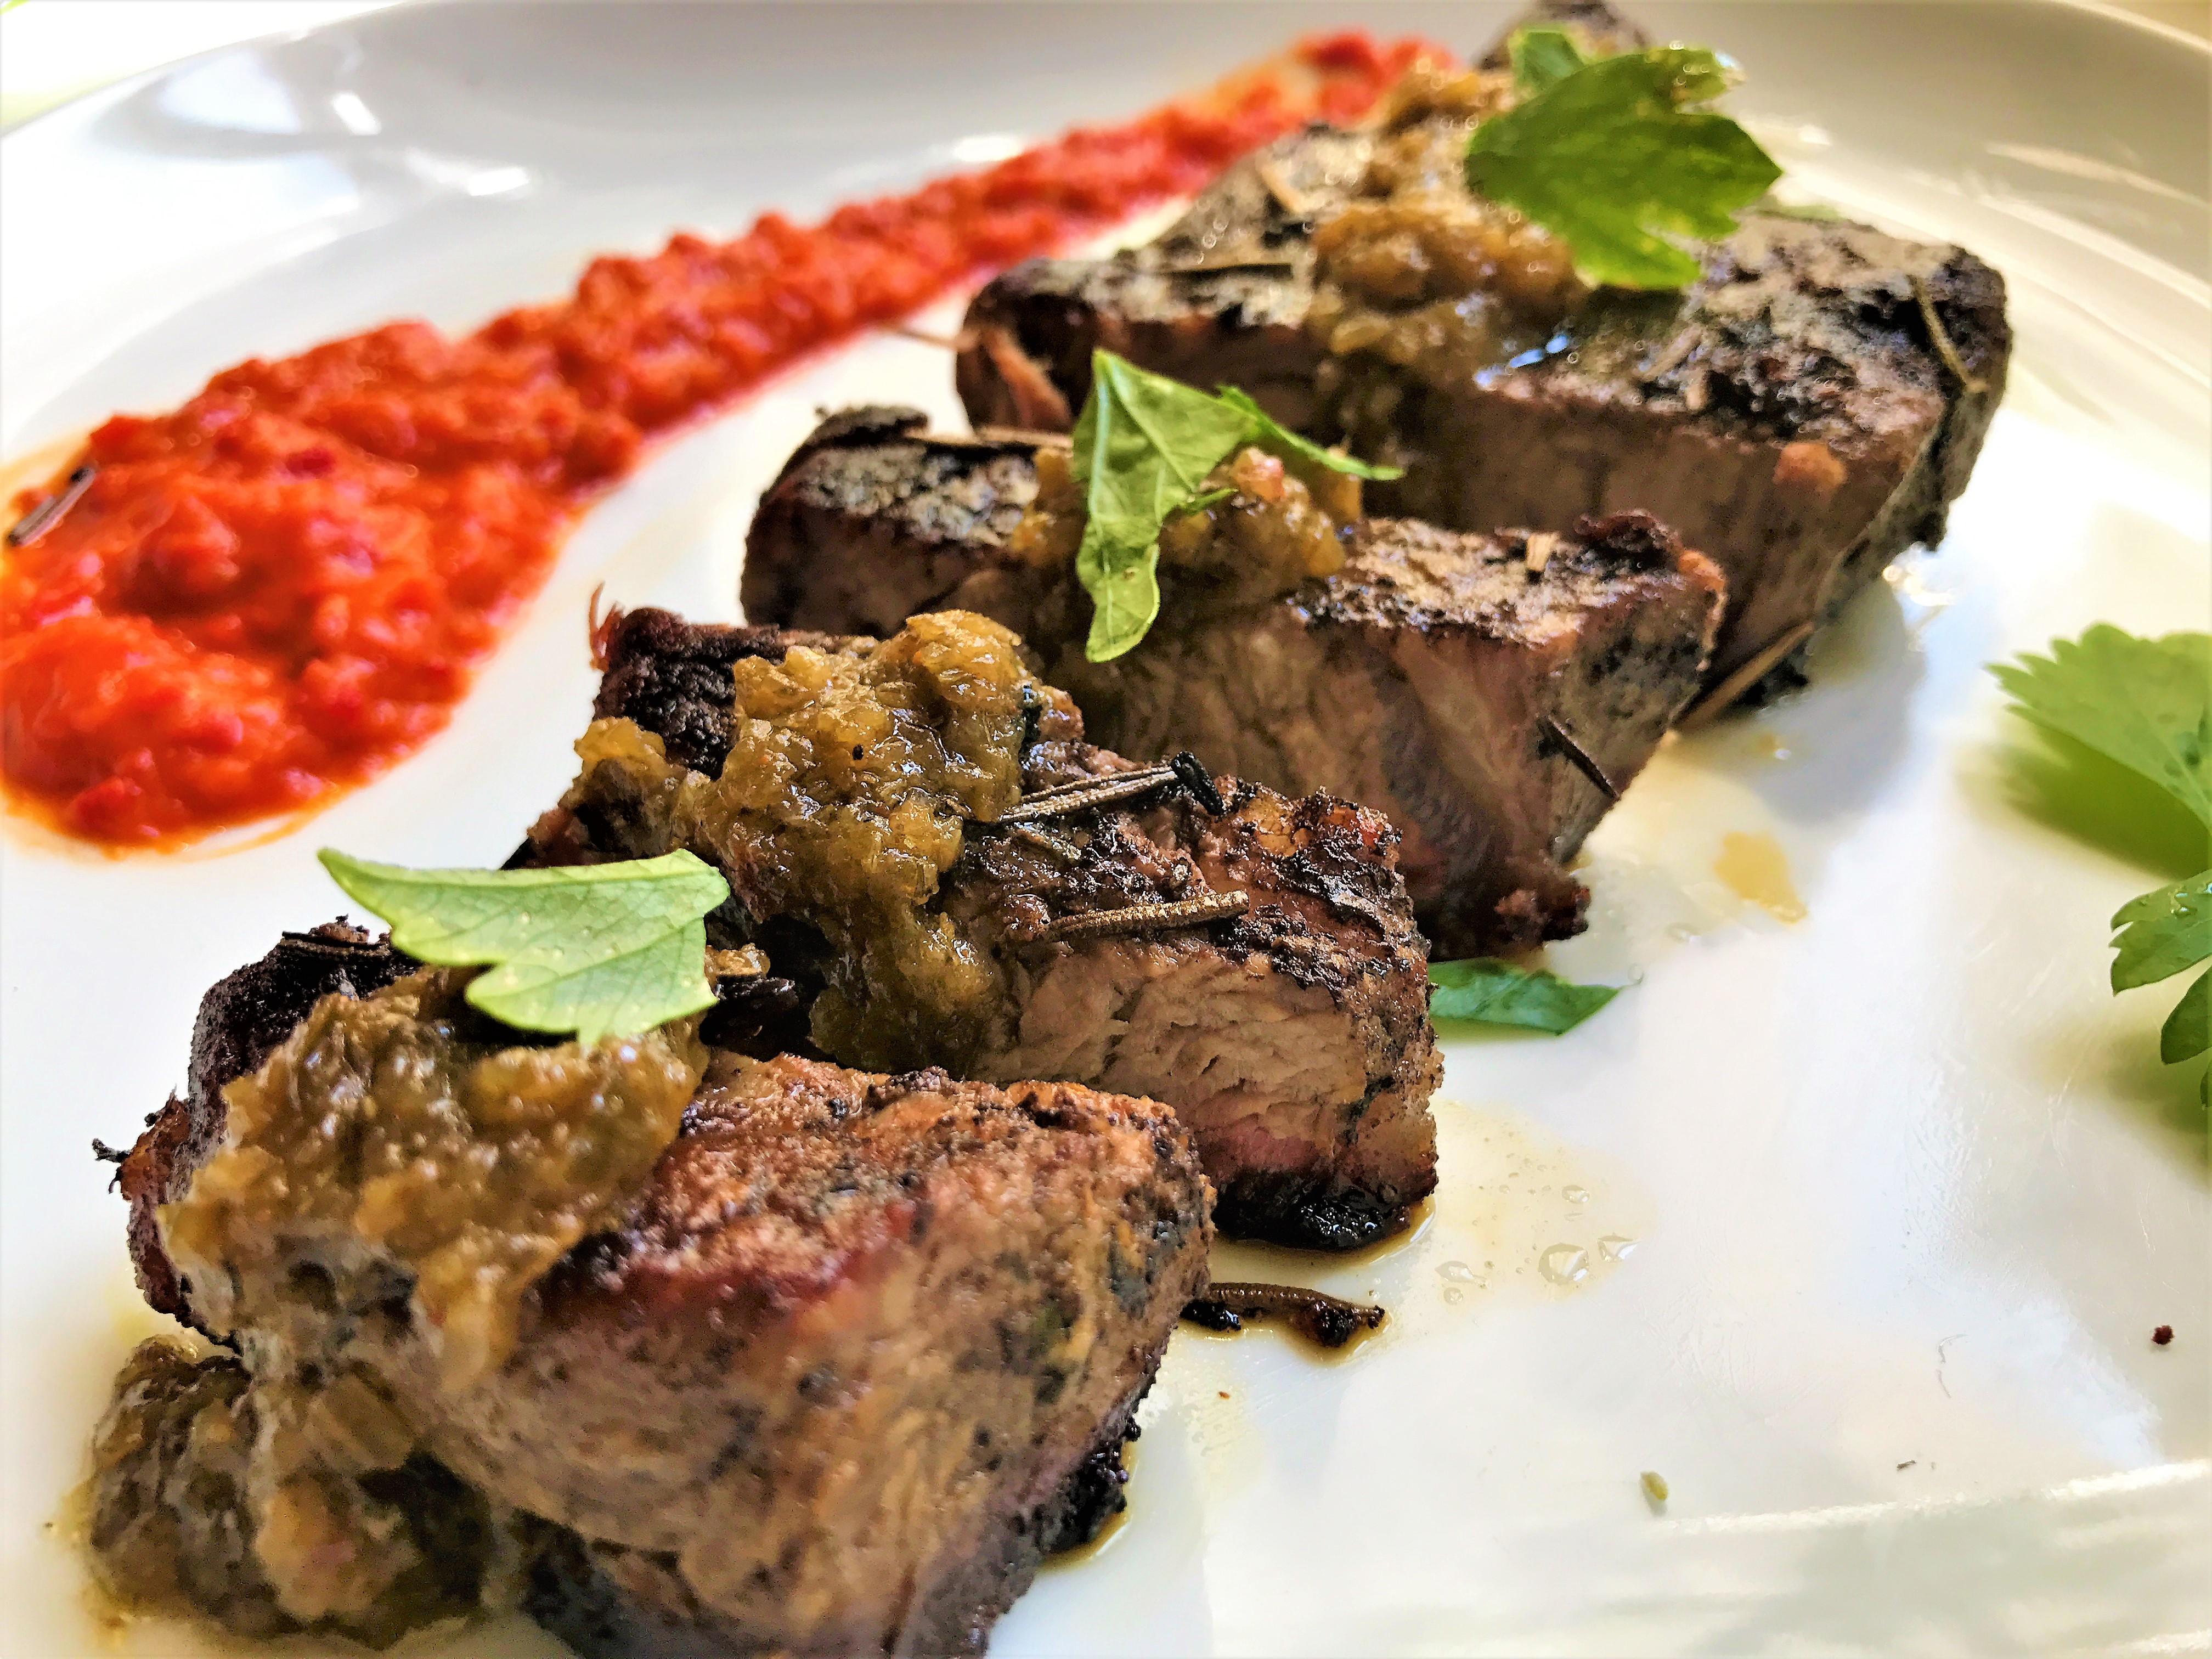 az_igazi_steak2.JPG